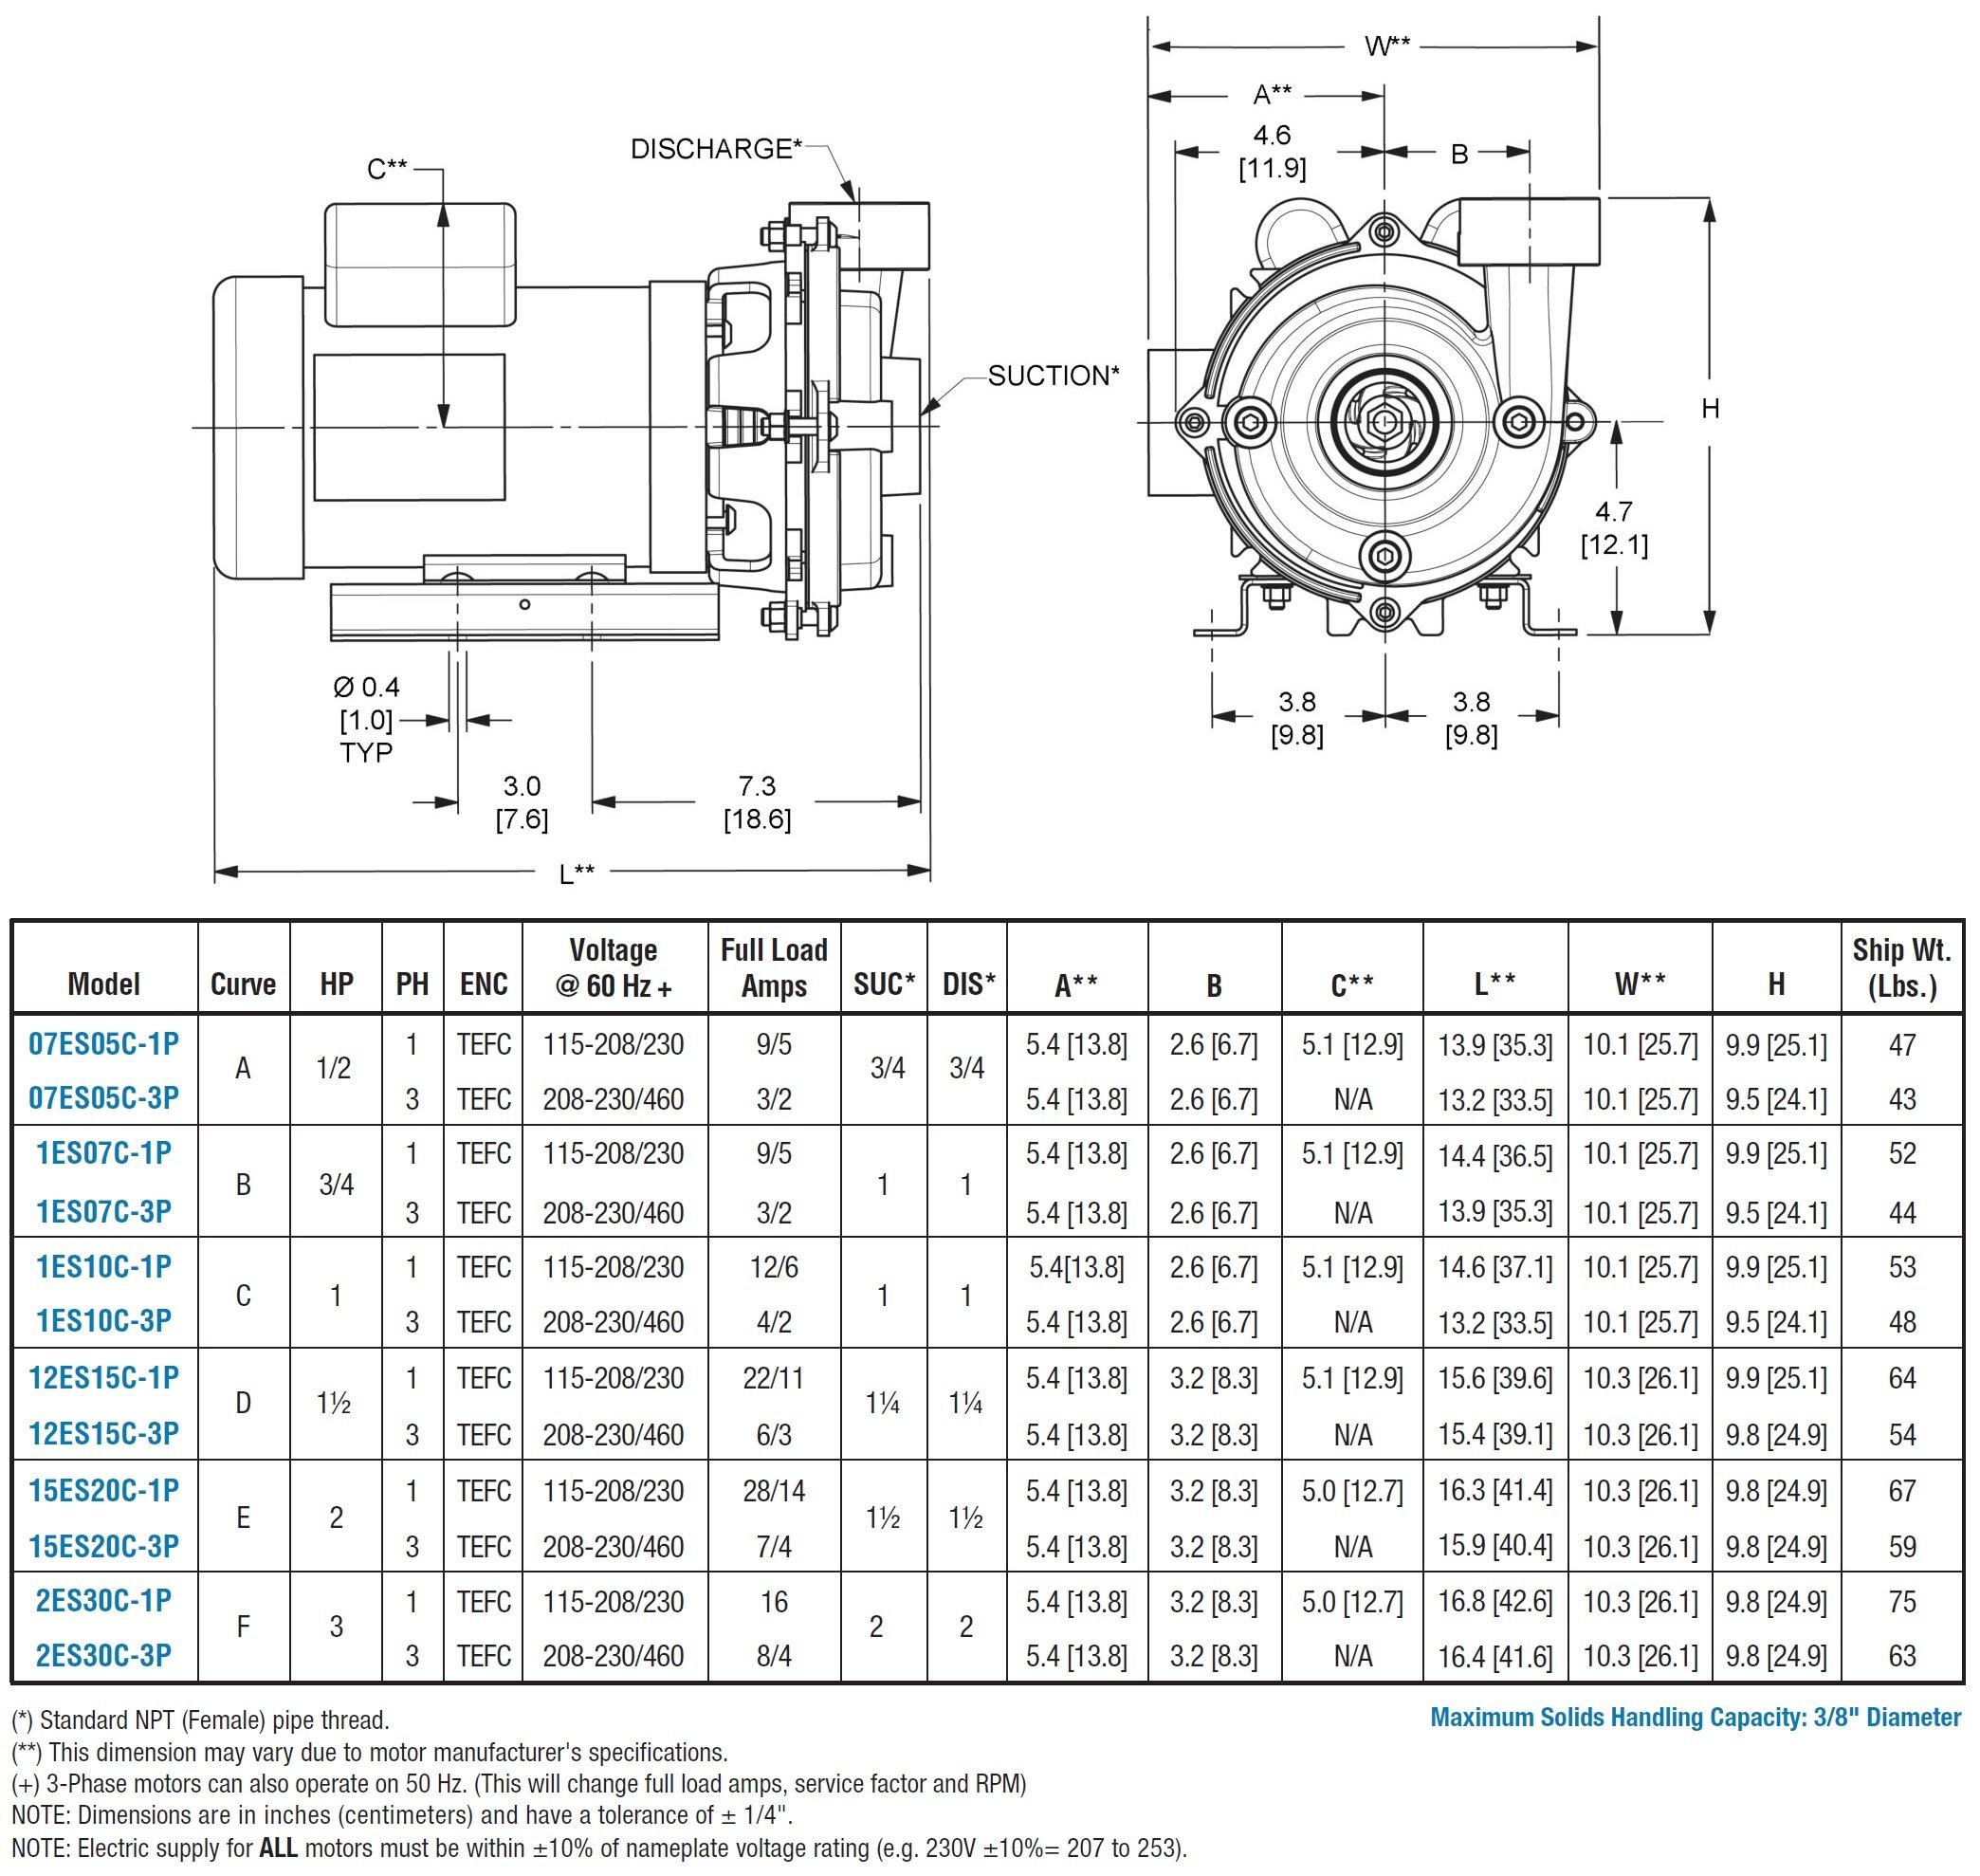 AMT 15ES20C-3P 1.5'' Cast Iron Straight Centrifugal End Suct. Chem Pump, EPDM/EPR Seal, 2hp, 3 Ph